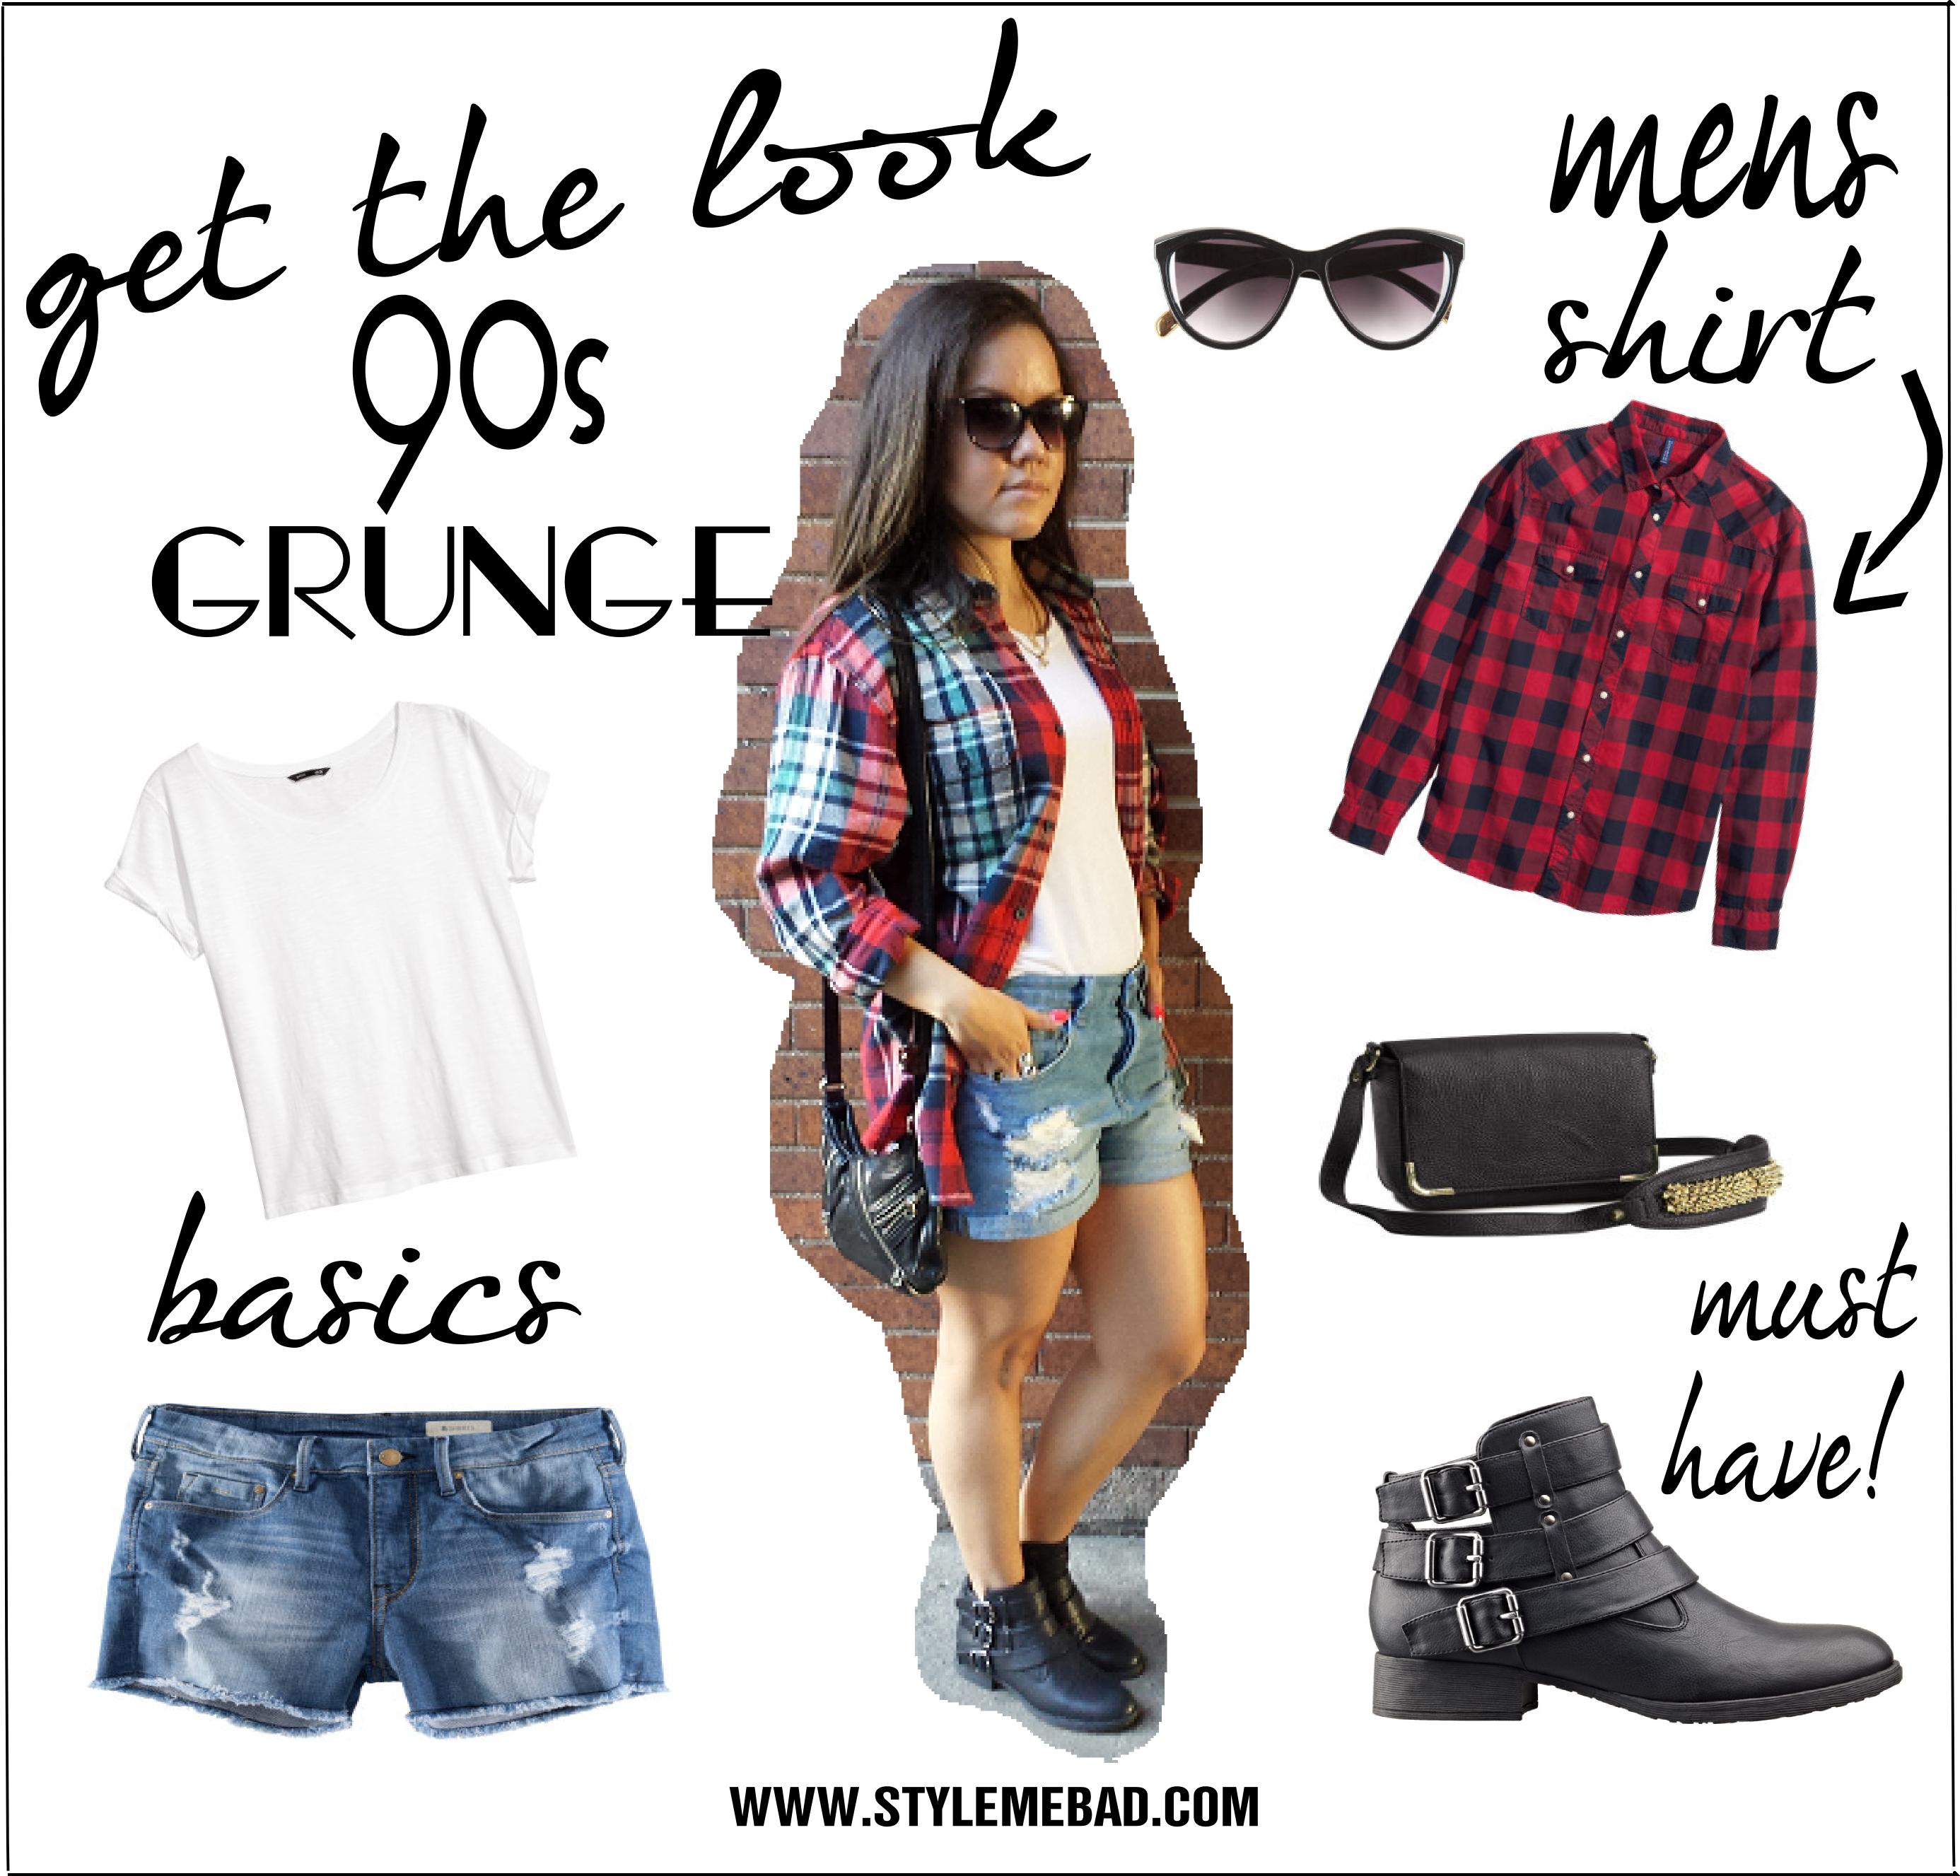 How to dress 90s grunge fashion